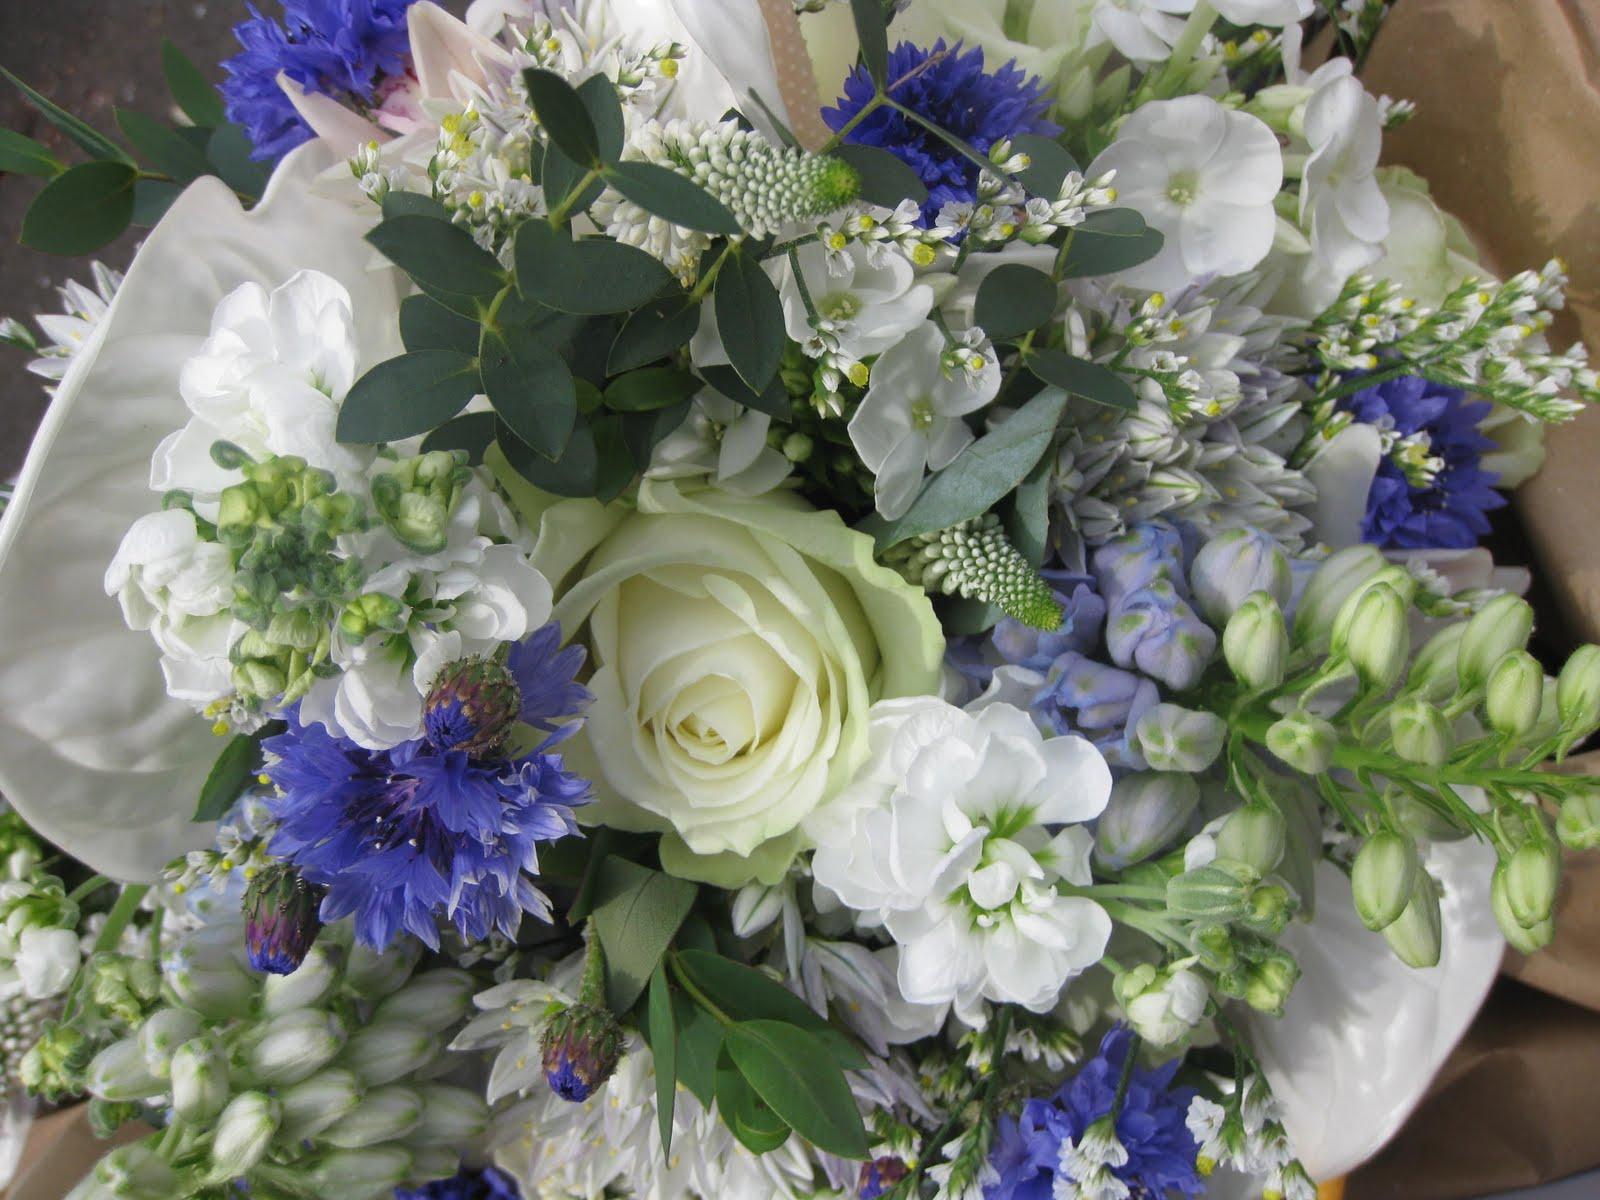 Laura coleman flowers september 2011 tuesday september 6 2011 mightylinksfo